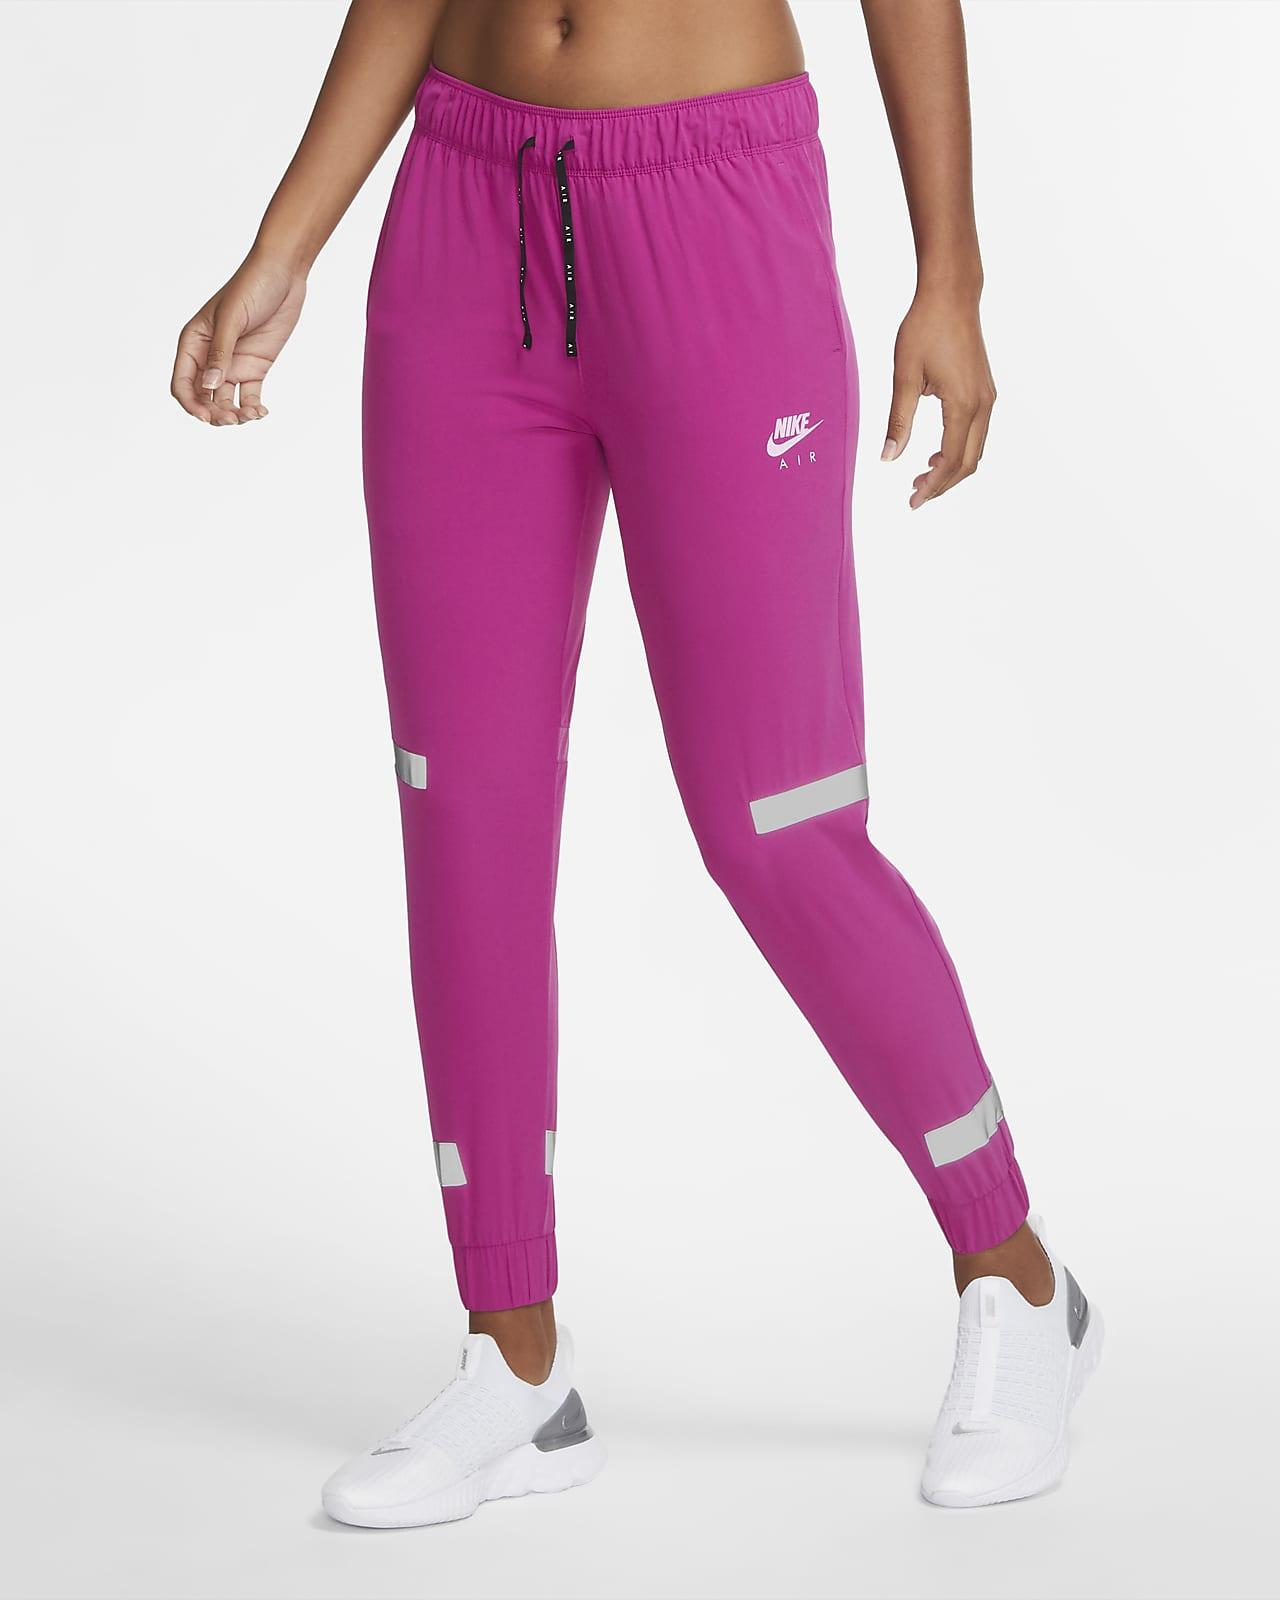 Pantalones De Running Para Mujer Nike Air Nike Pr